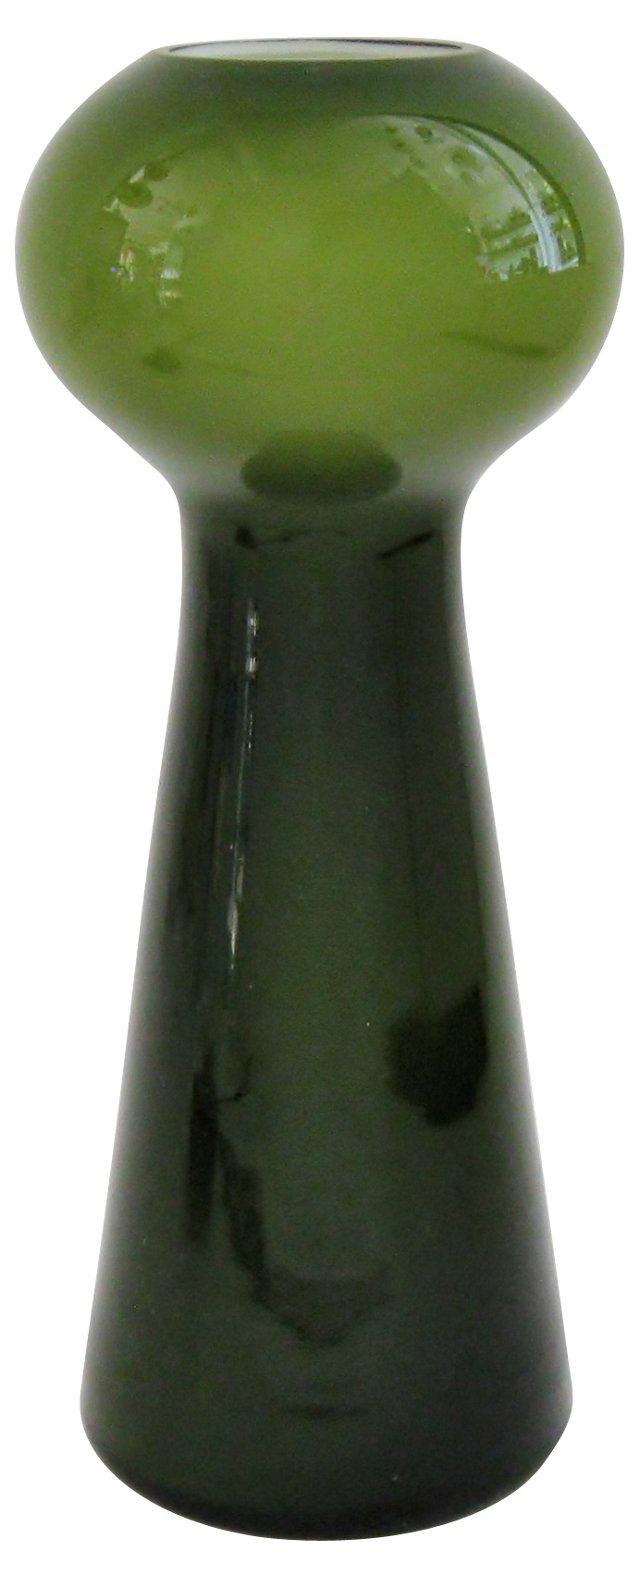 Olive Cased Glass Vase